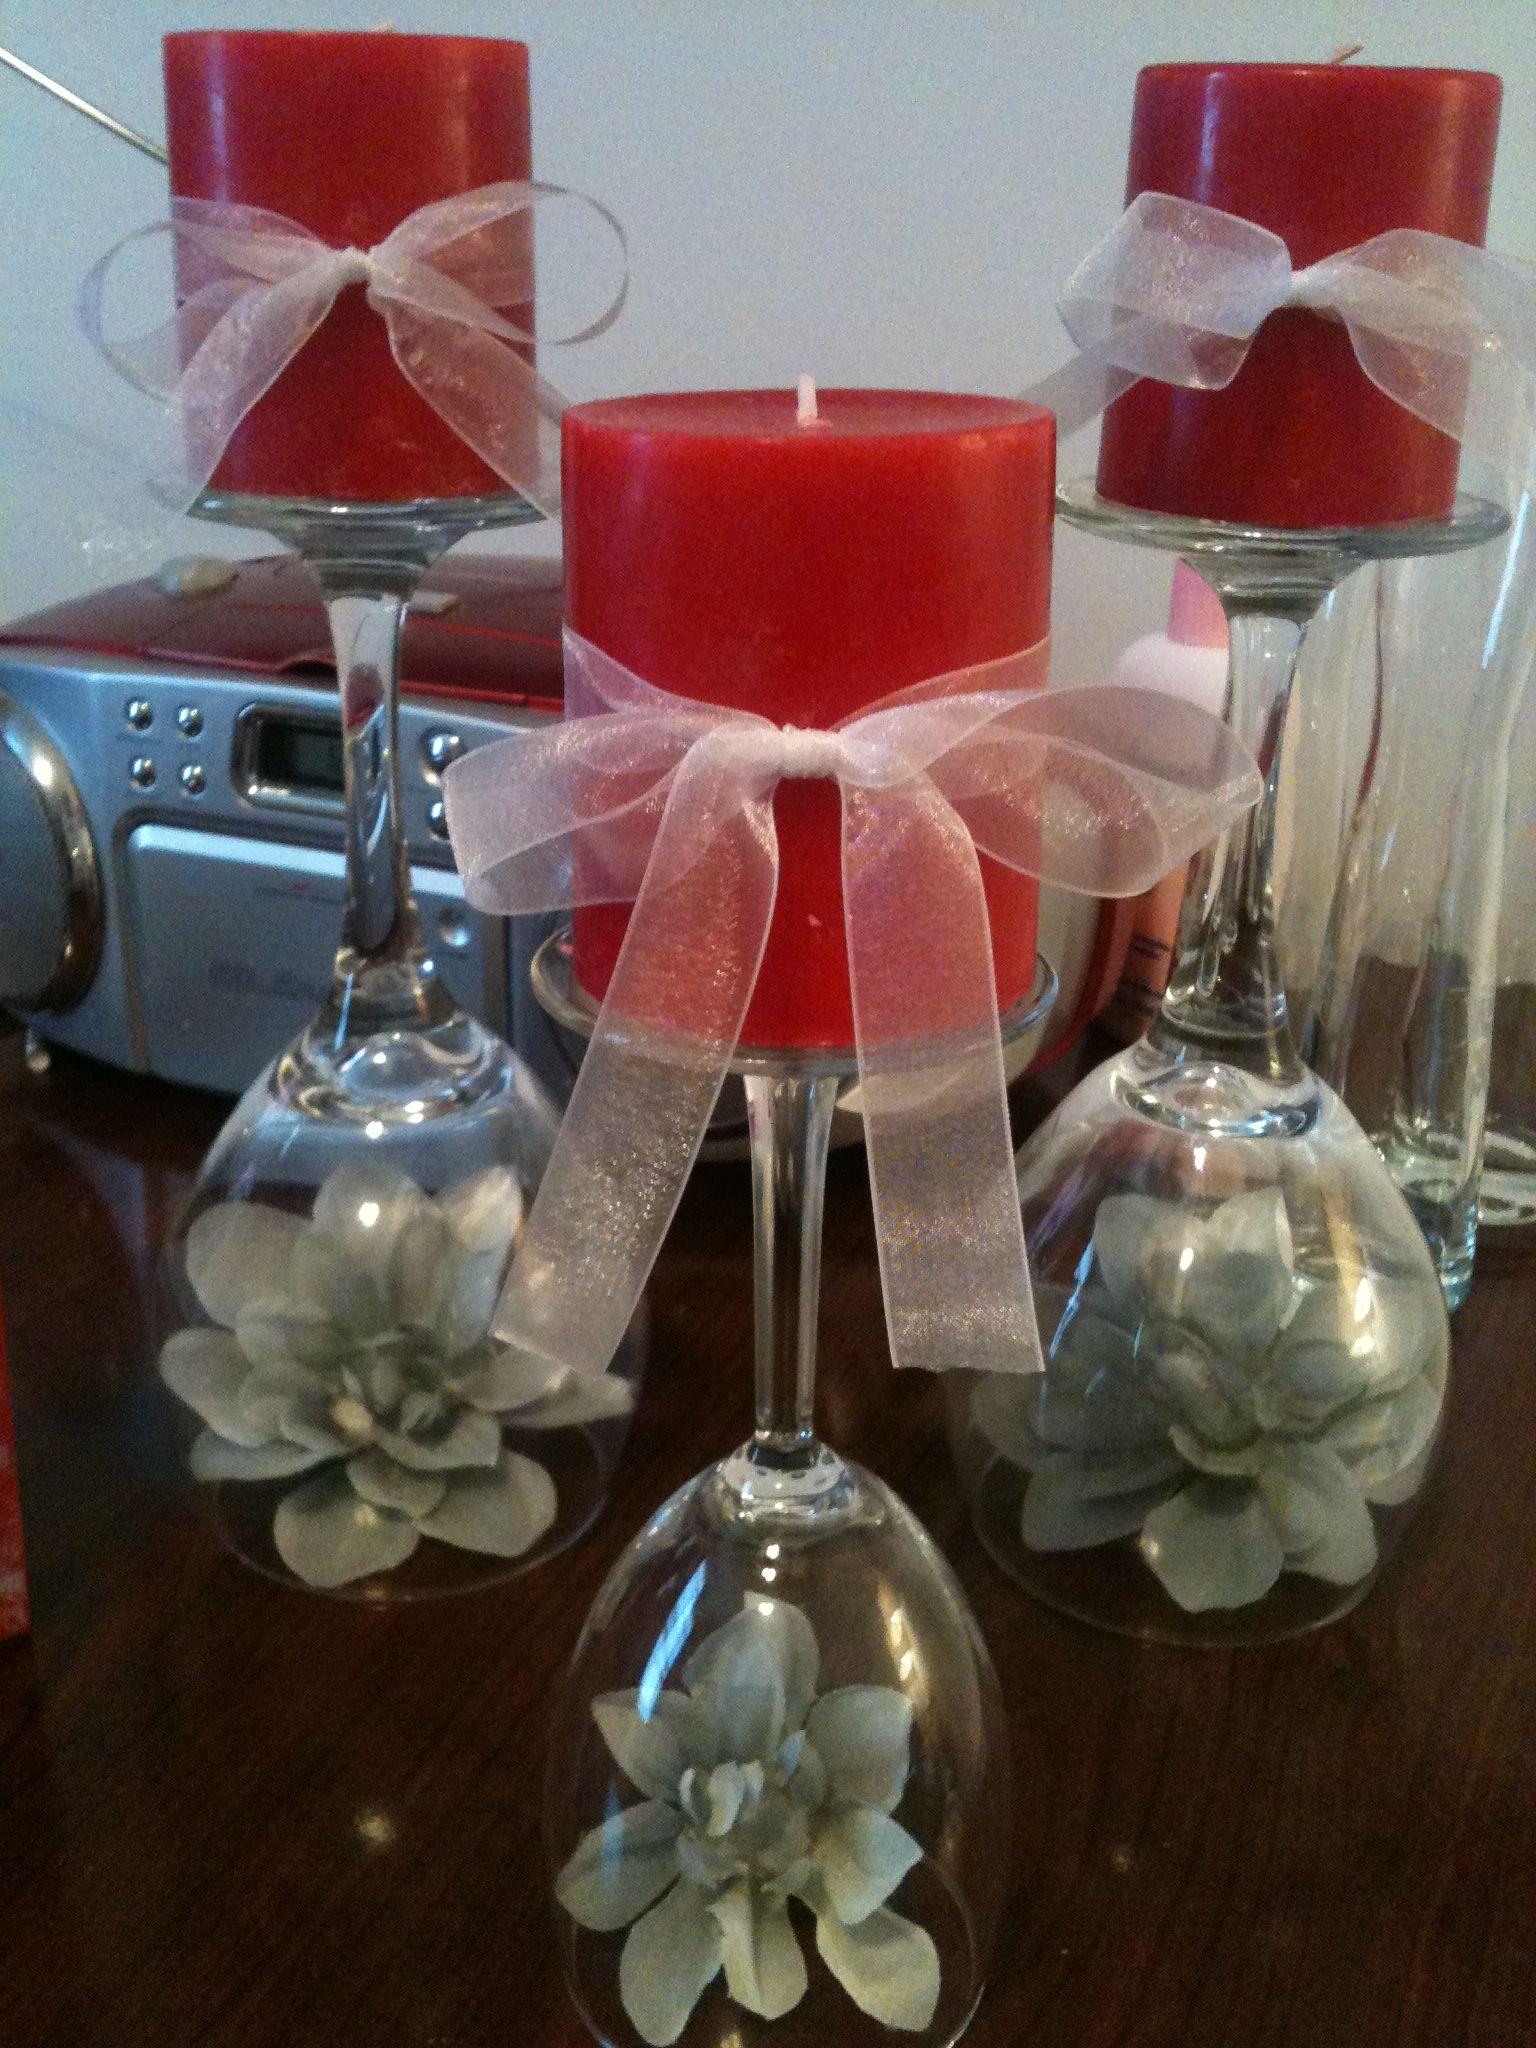 My Wedding Reception Centerpiece For Bride Groom Table